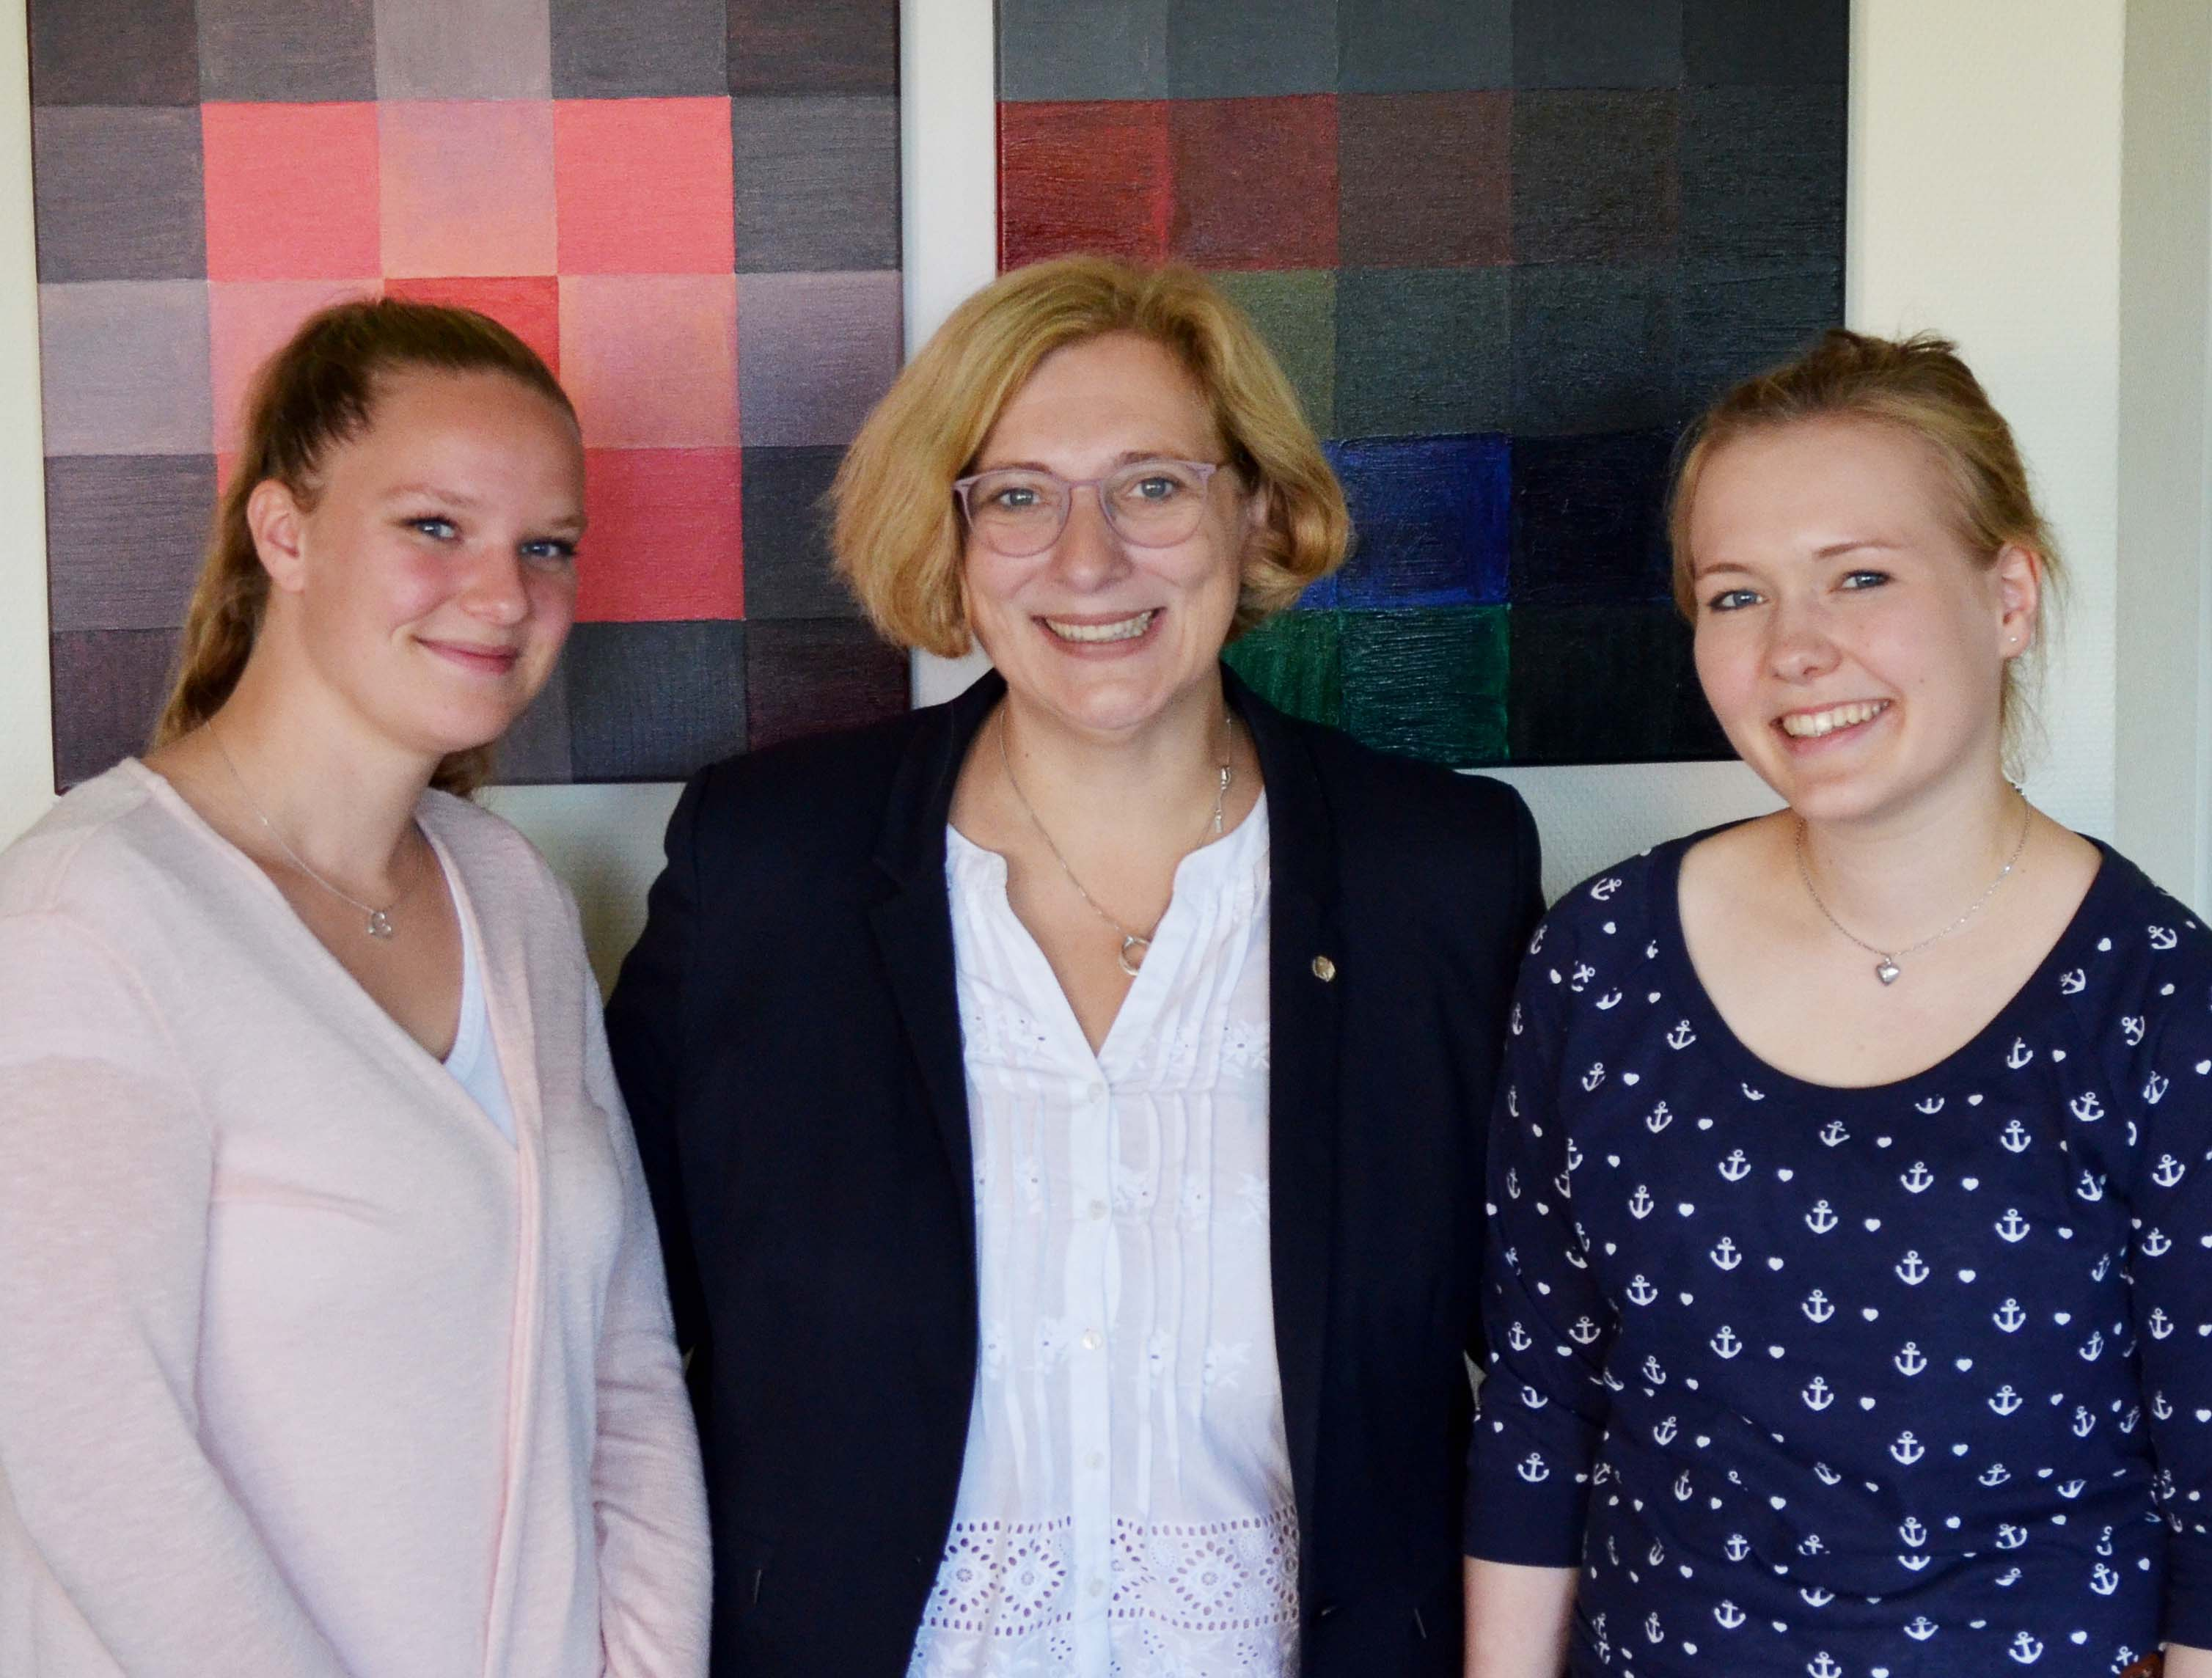 Isa-Sophie Upadek, Dr. Daniela De Ridder und Marie Baalmann